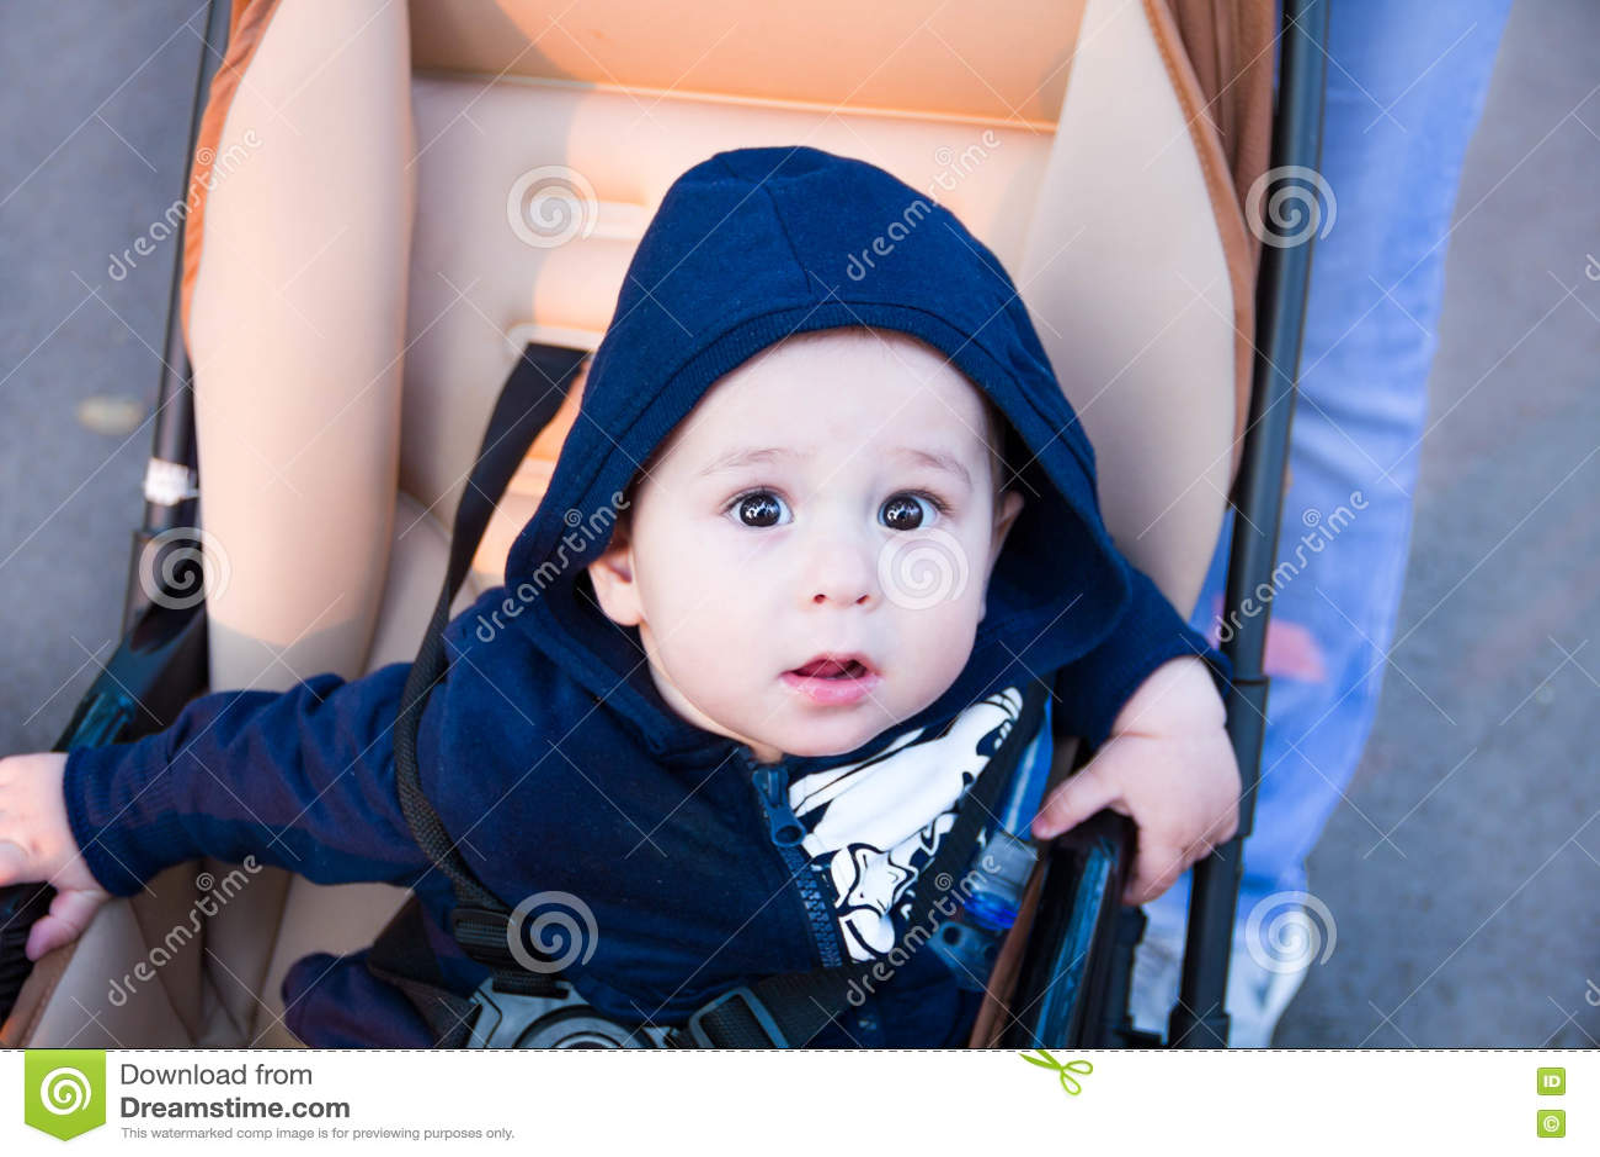 small cute newborn baby boy sitting in a carriage in warm winter